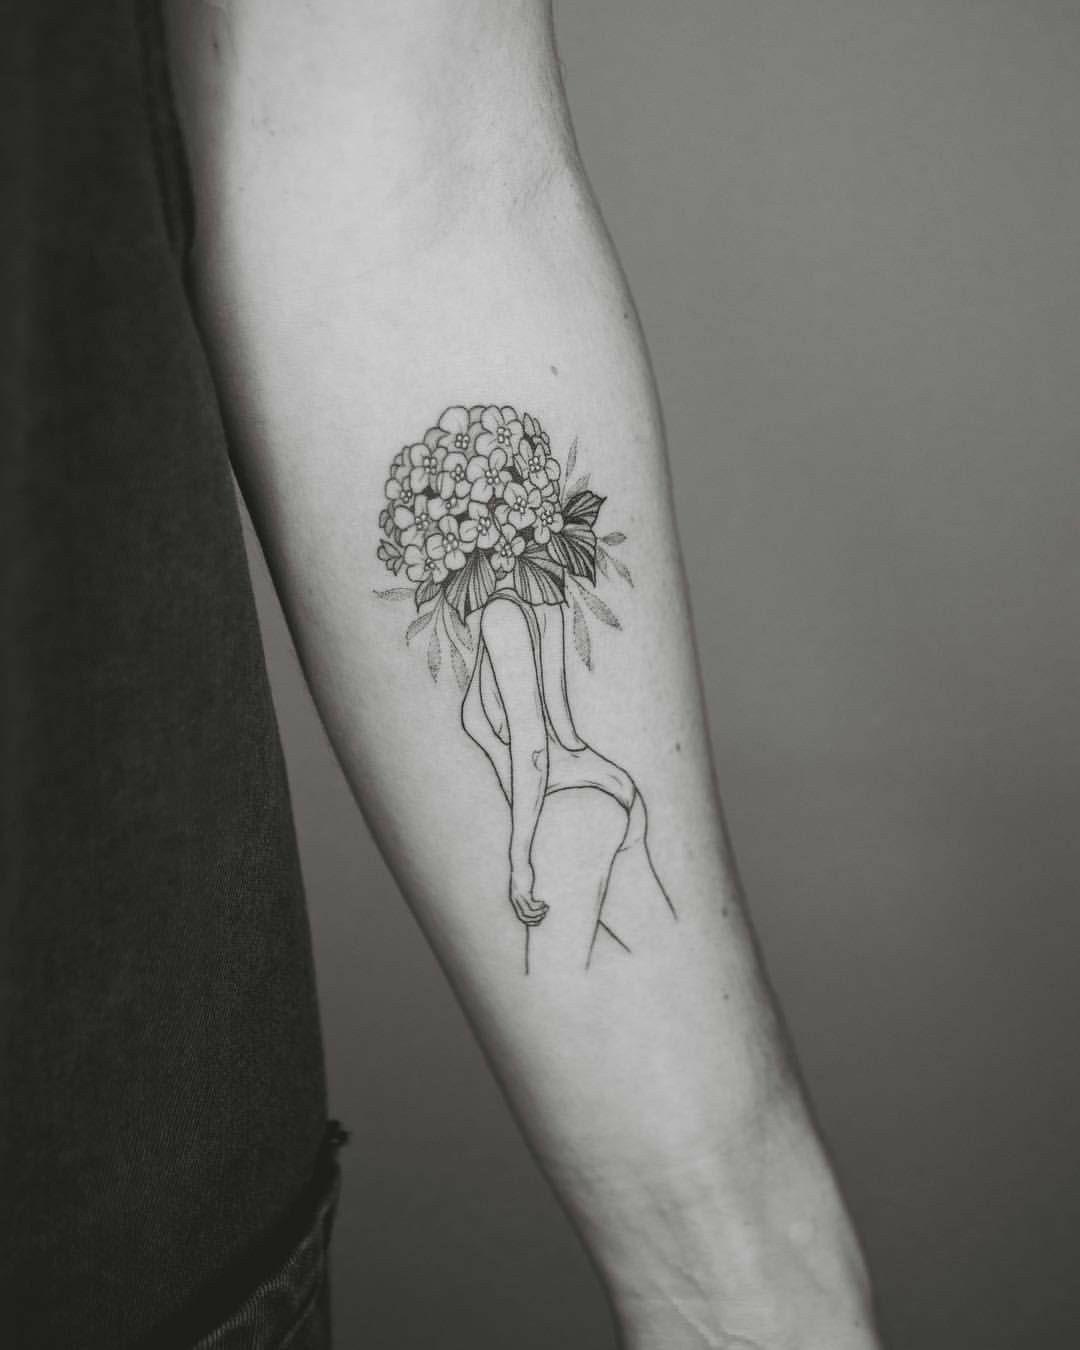 Hydrangea Tattoo Black And White Google Search Hydrangea Tattoo Tattoos Black Tattoos